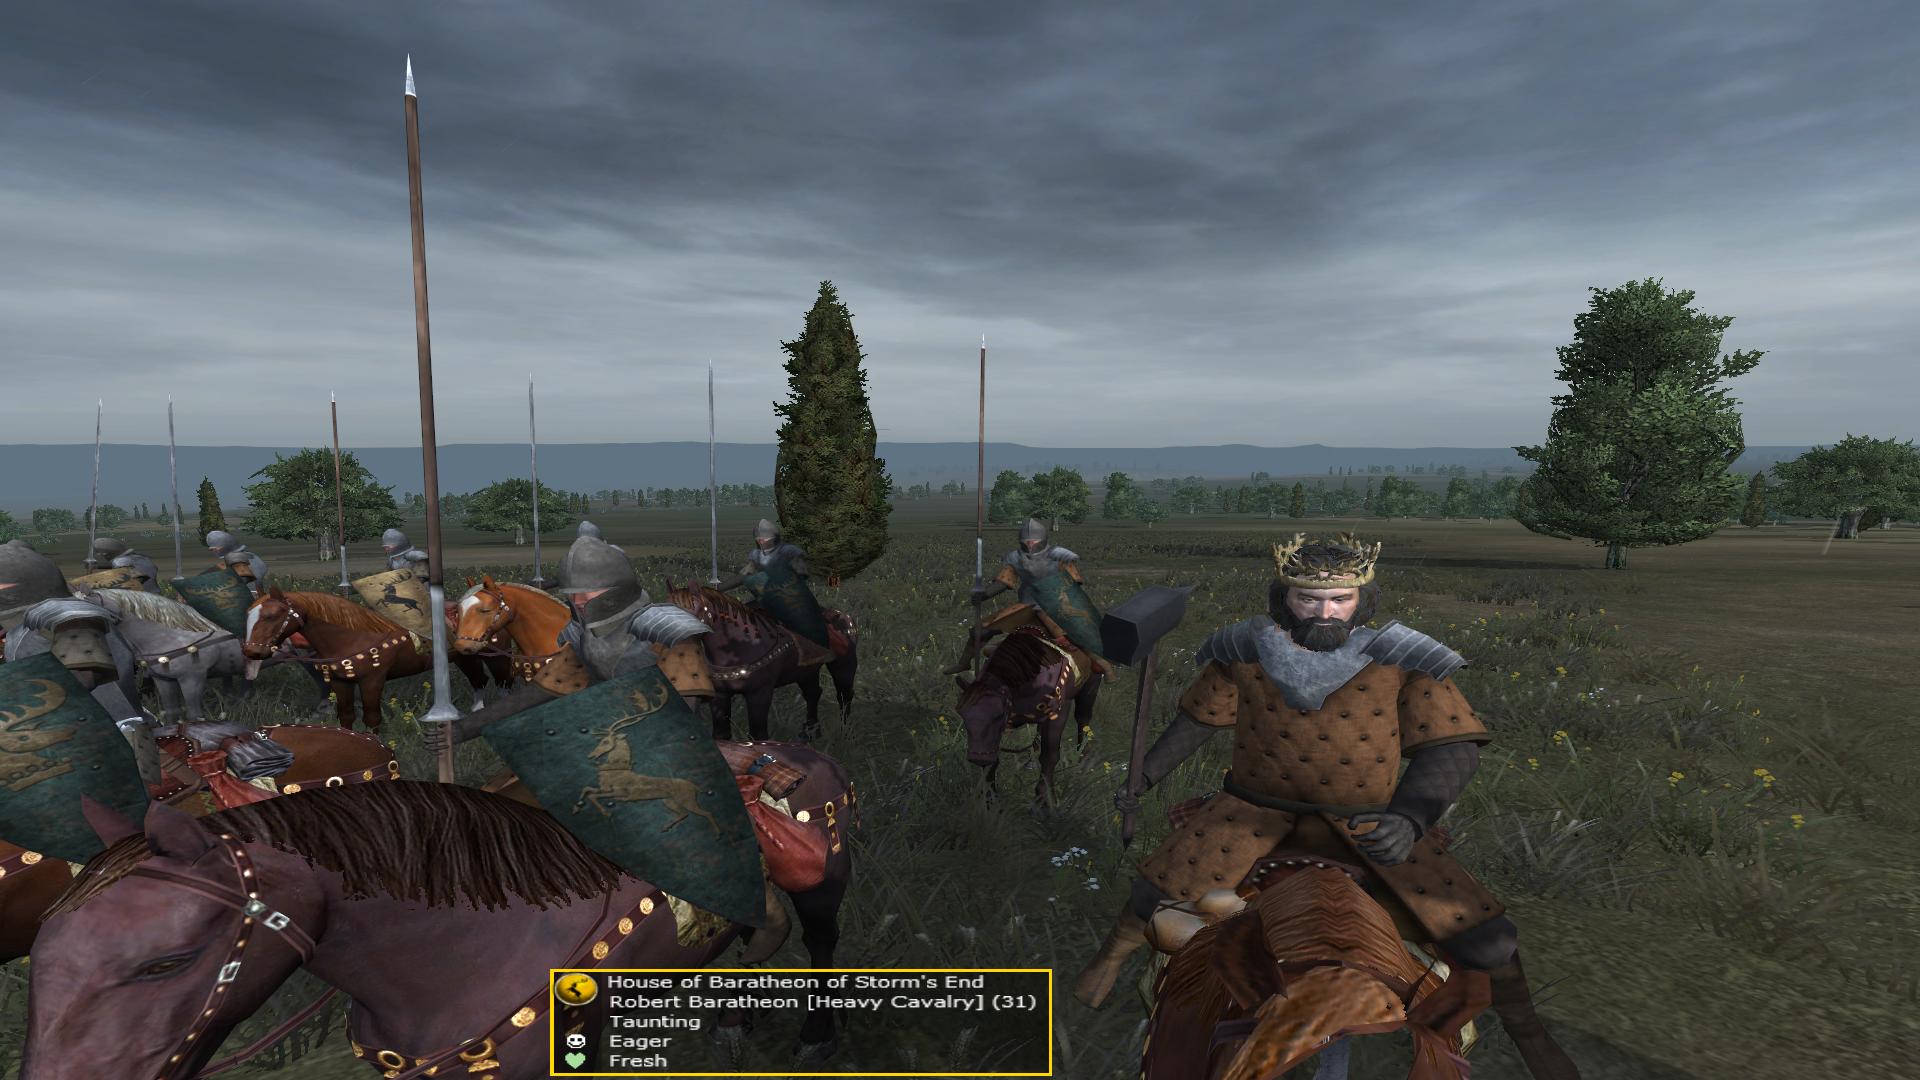 King Robert Baratheon added to the custom battles as a new hero!